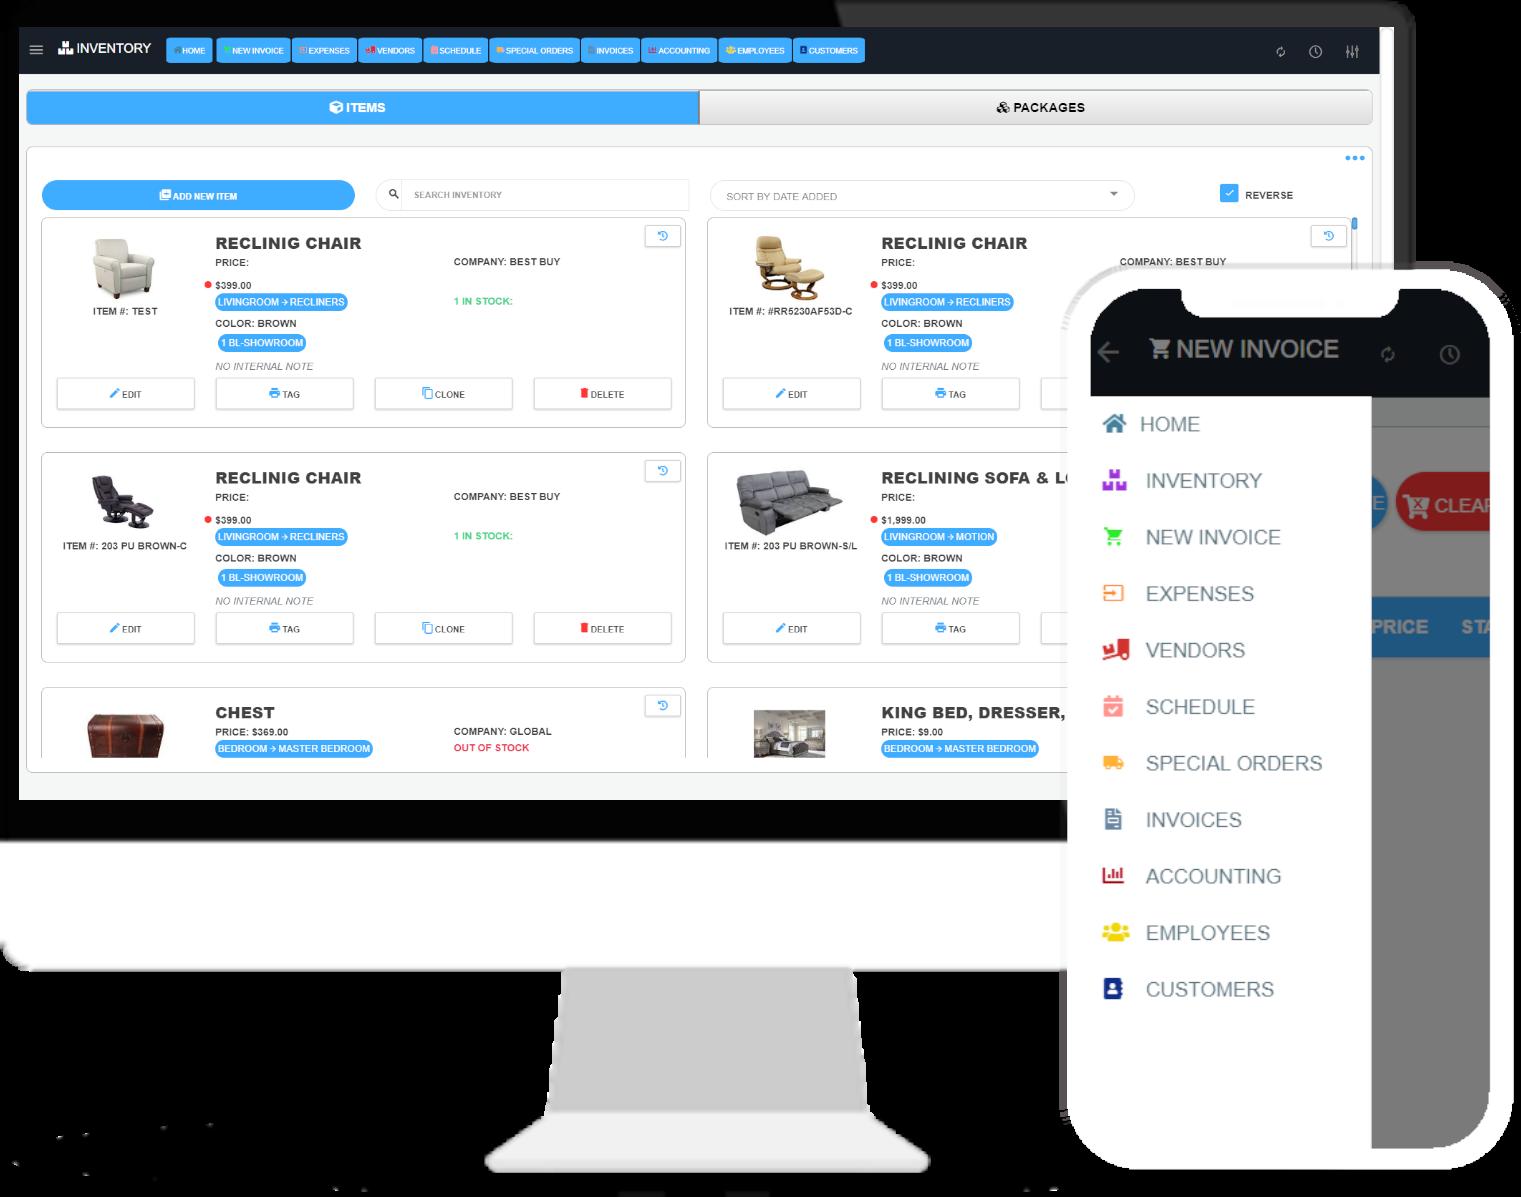 M&M POS System Screenshot